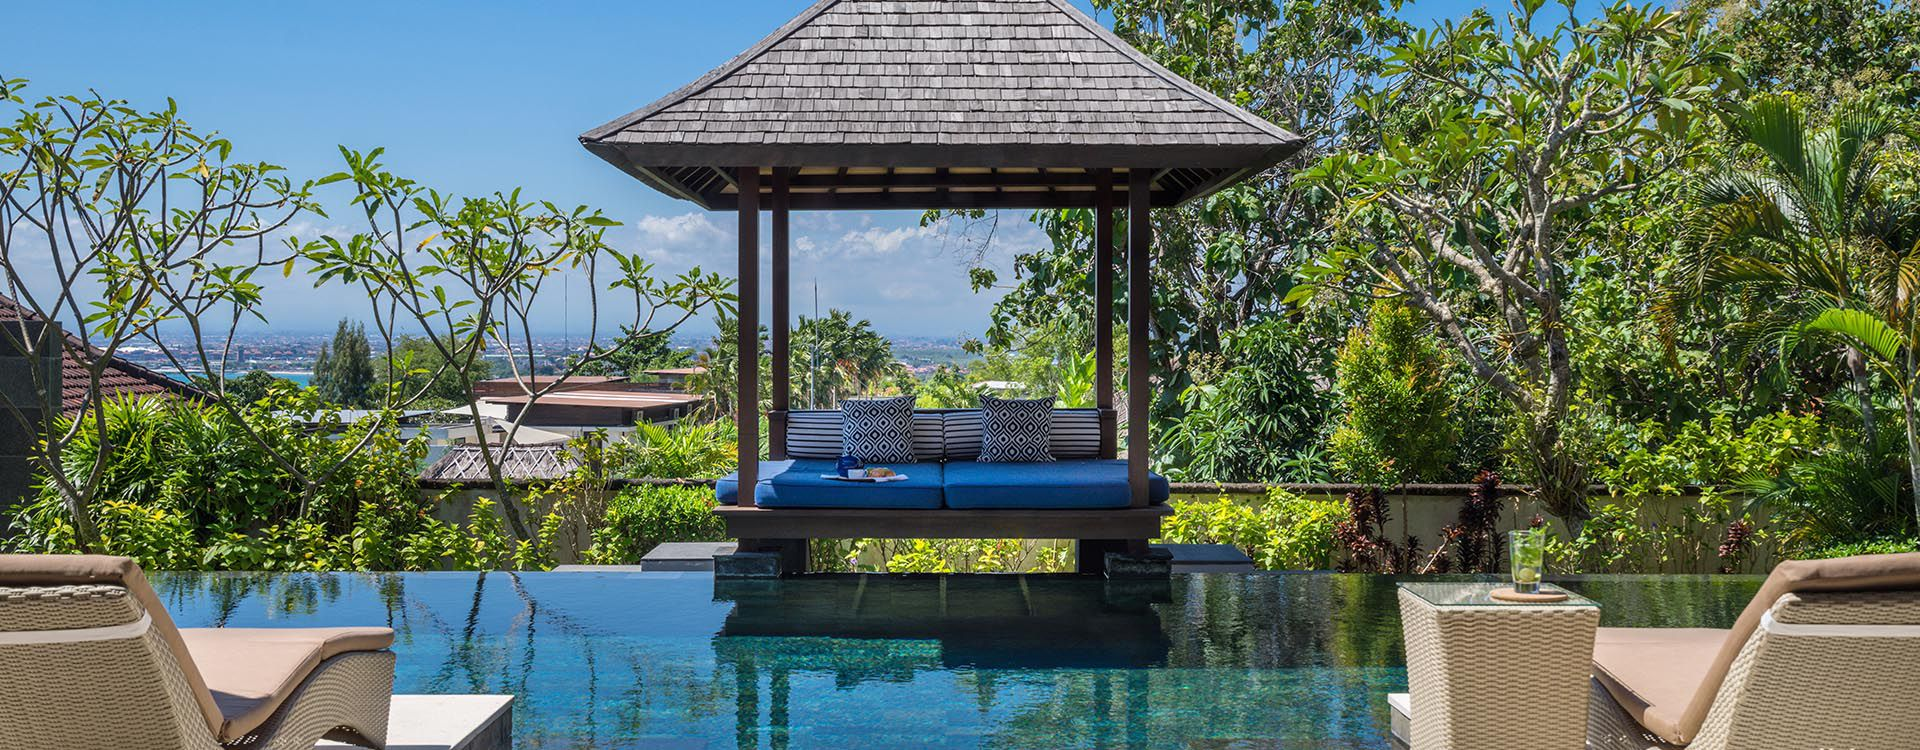 Links | Villa Adenium - Jimbaran 4 bedroom luxury villa, Bali